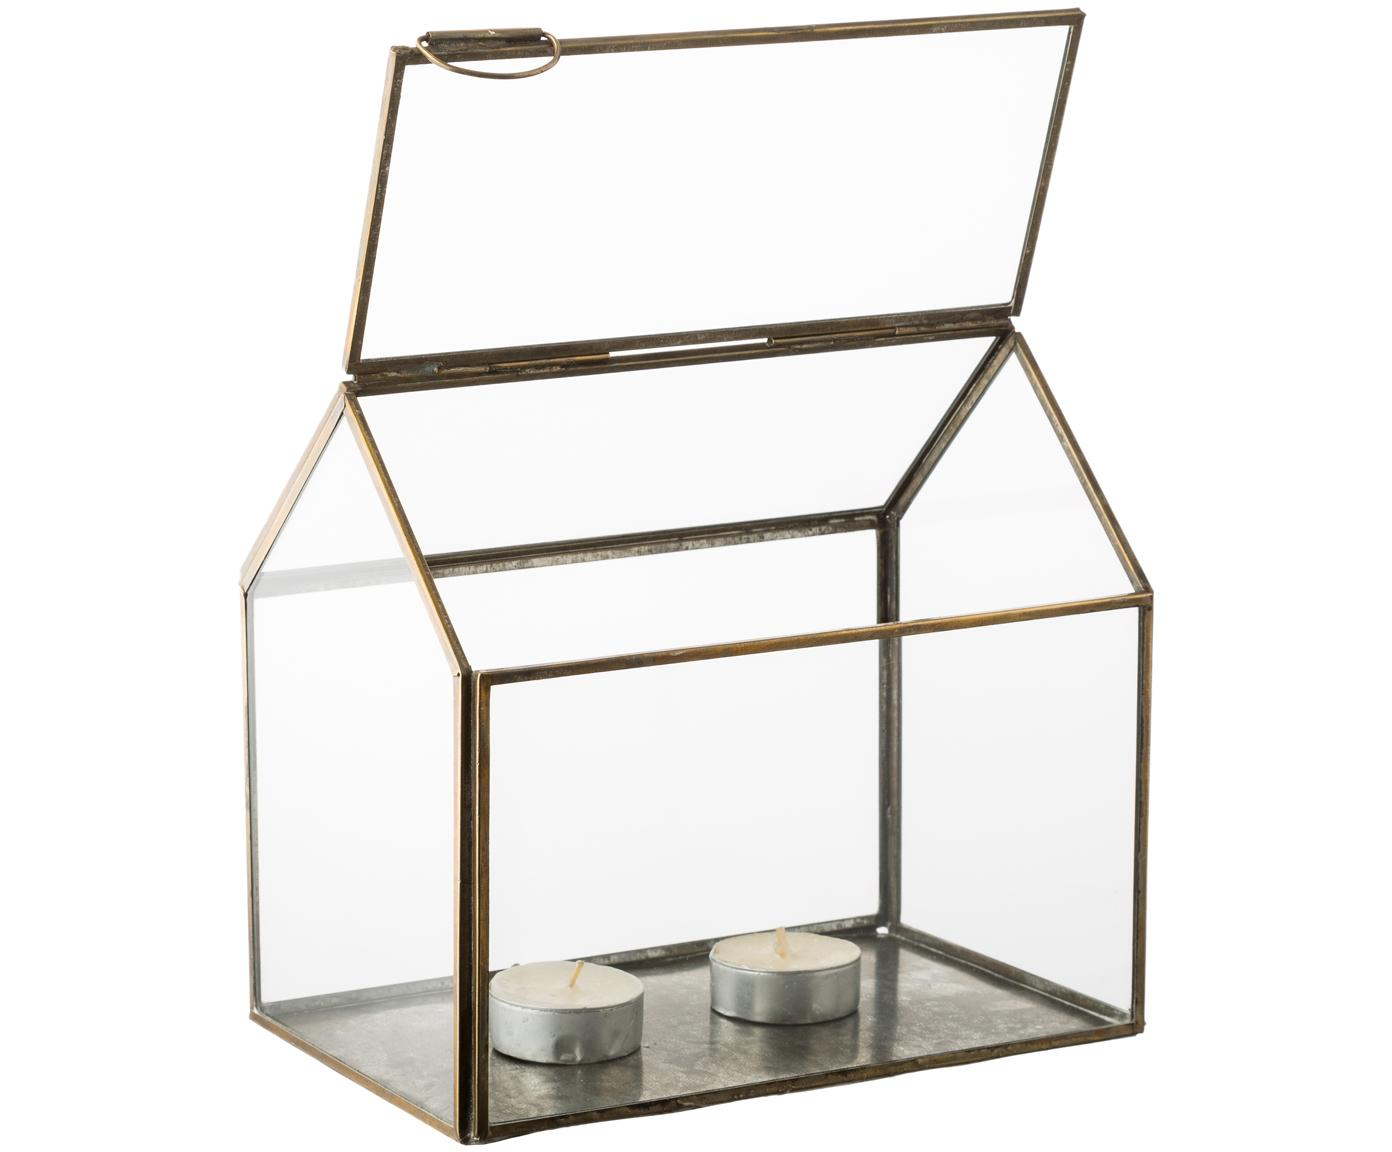 Portavelas My House, Estructura: metal, recubierto, Bronce, An 19 x Al 18 cm